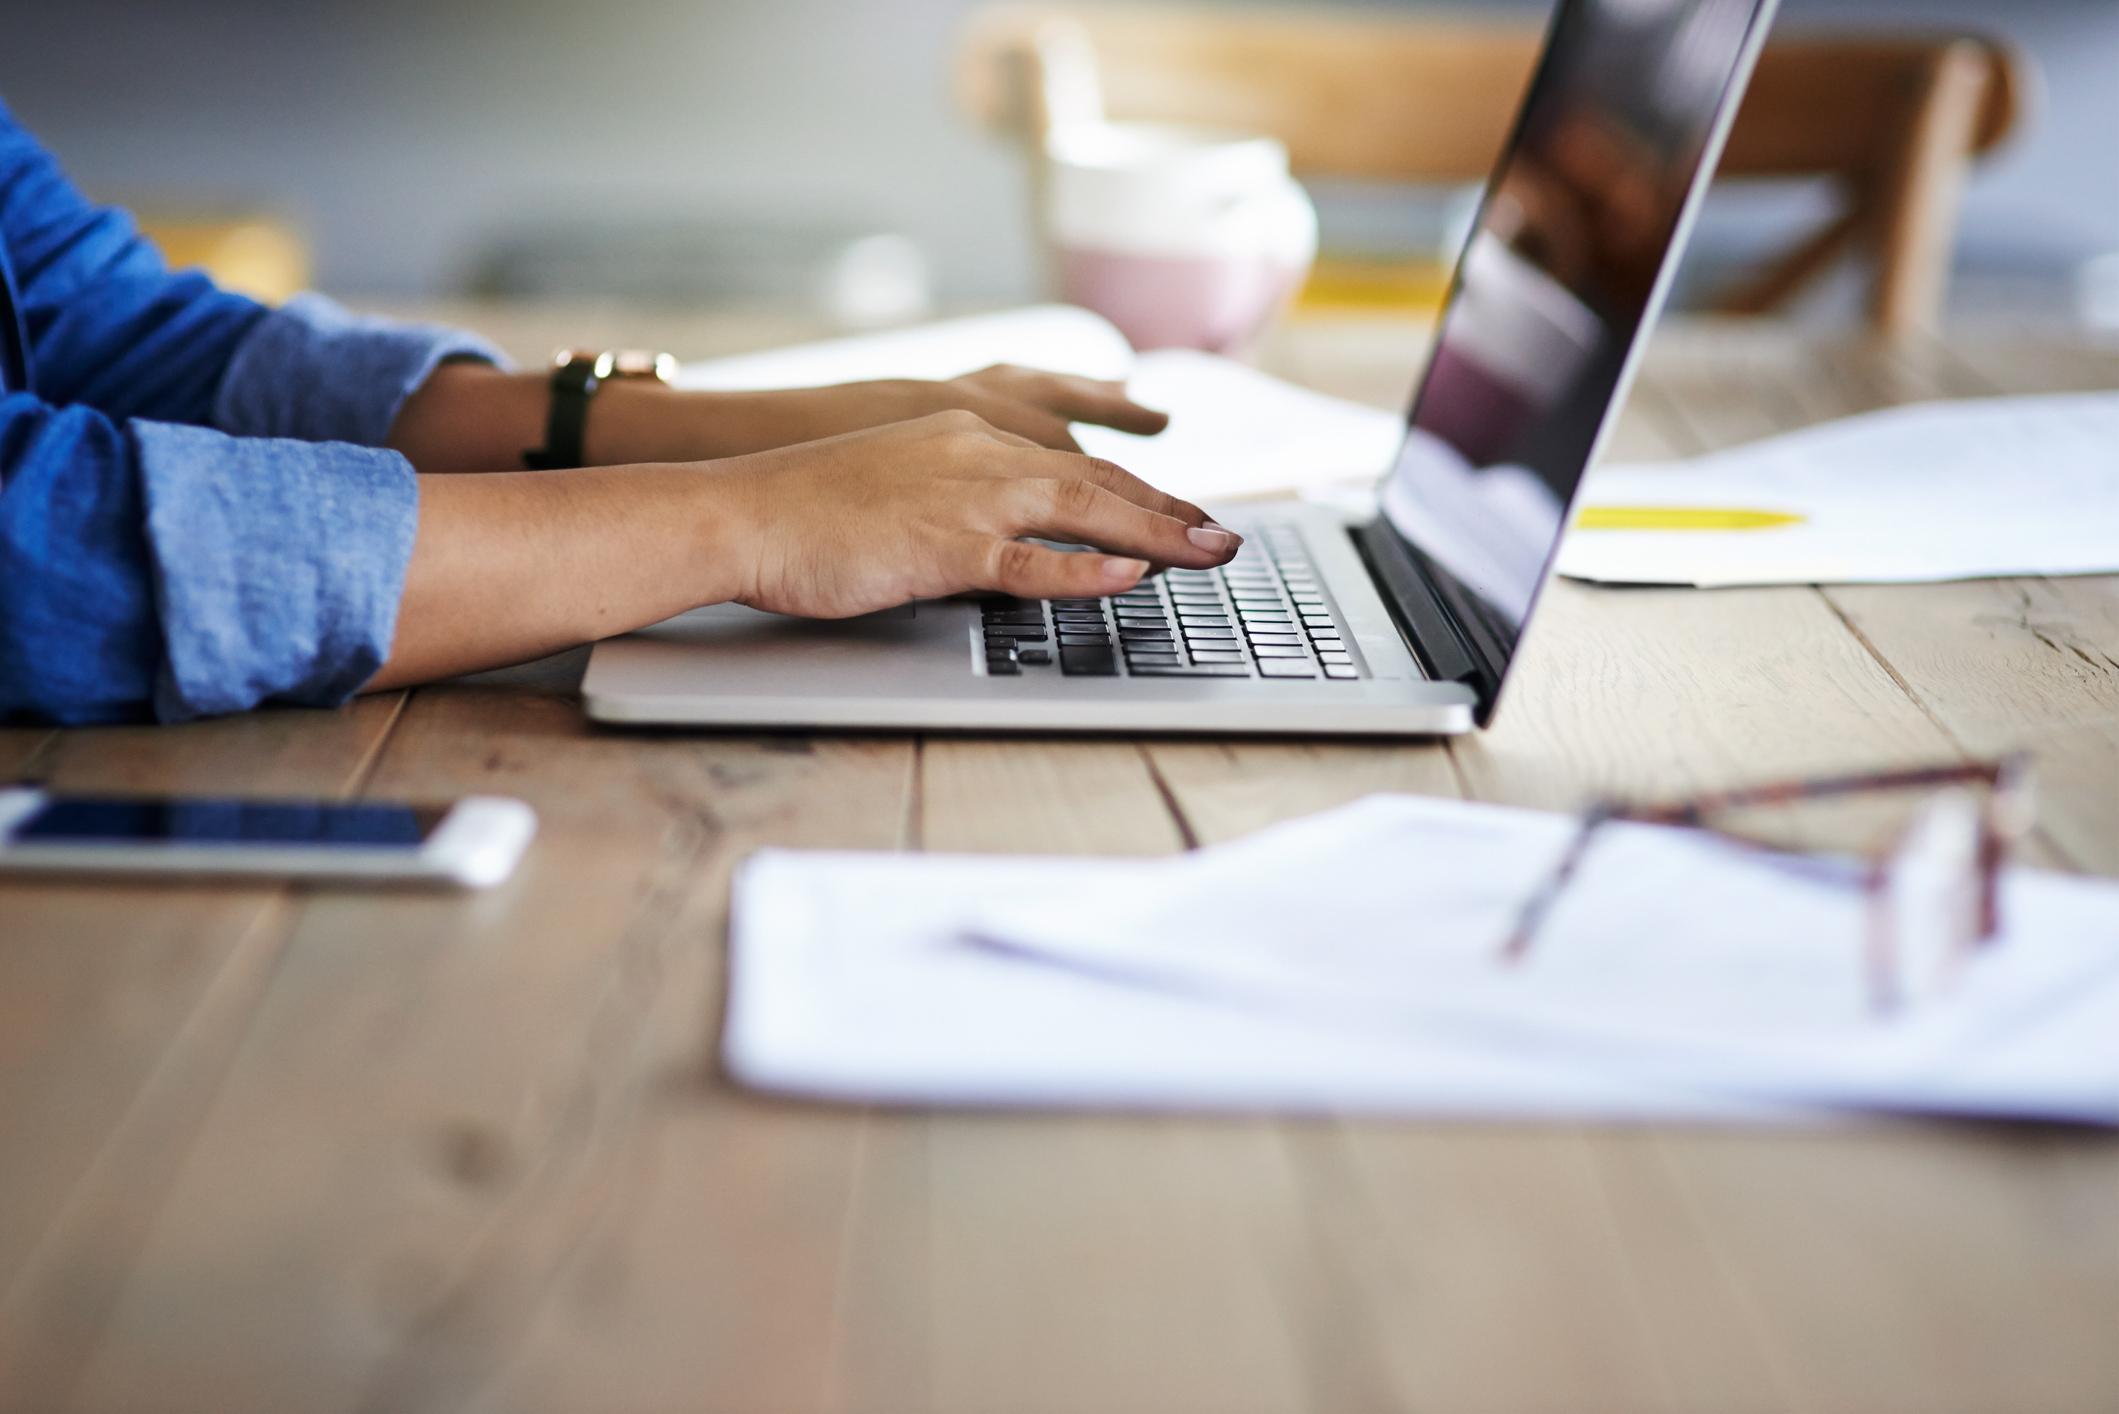 Hands on laptop using fiber internet